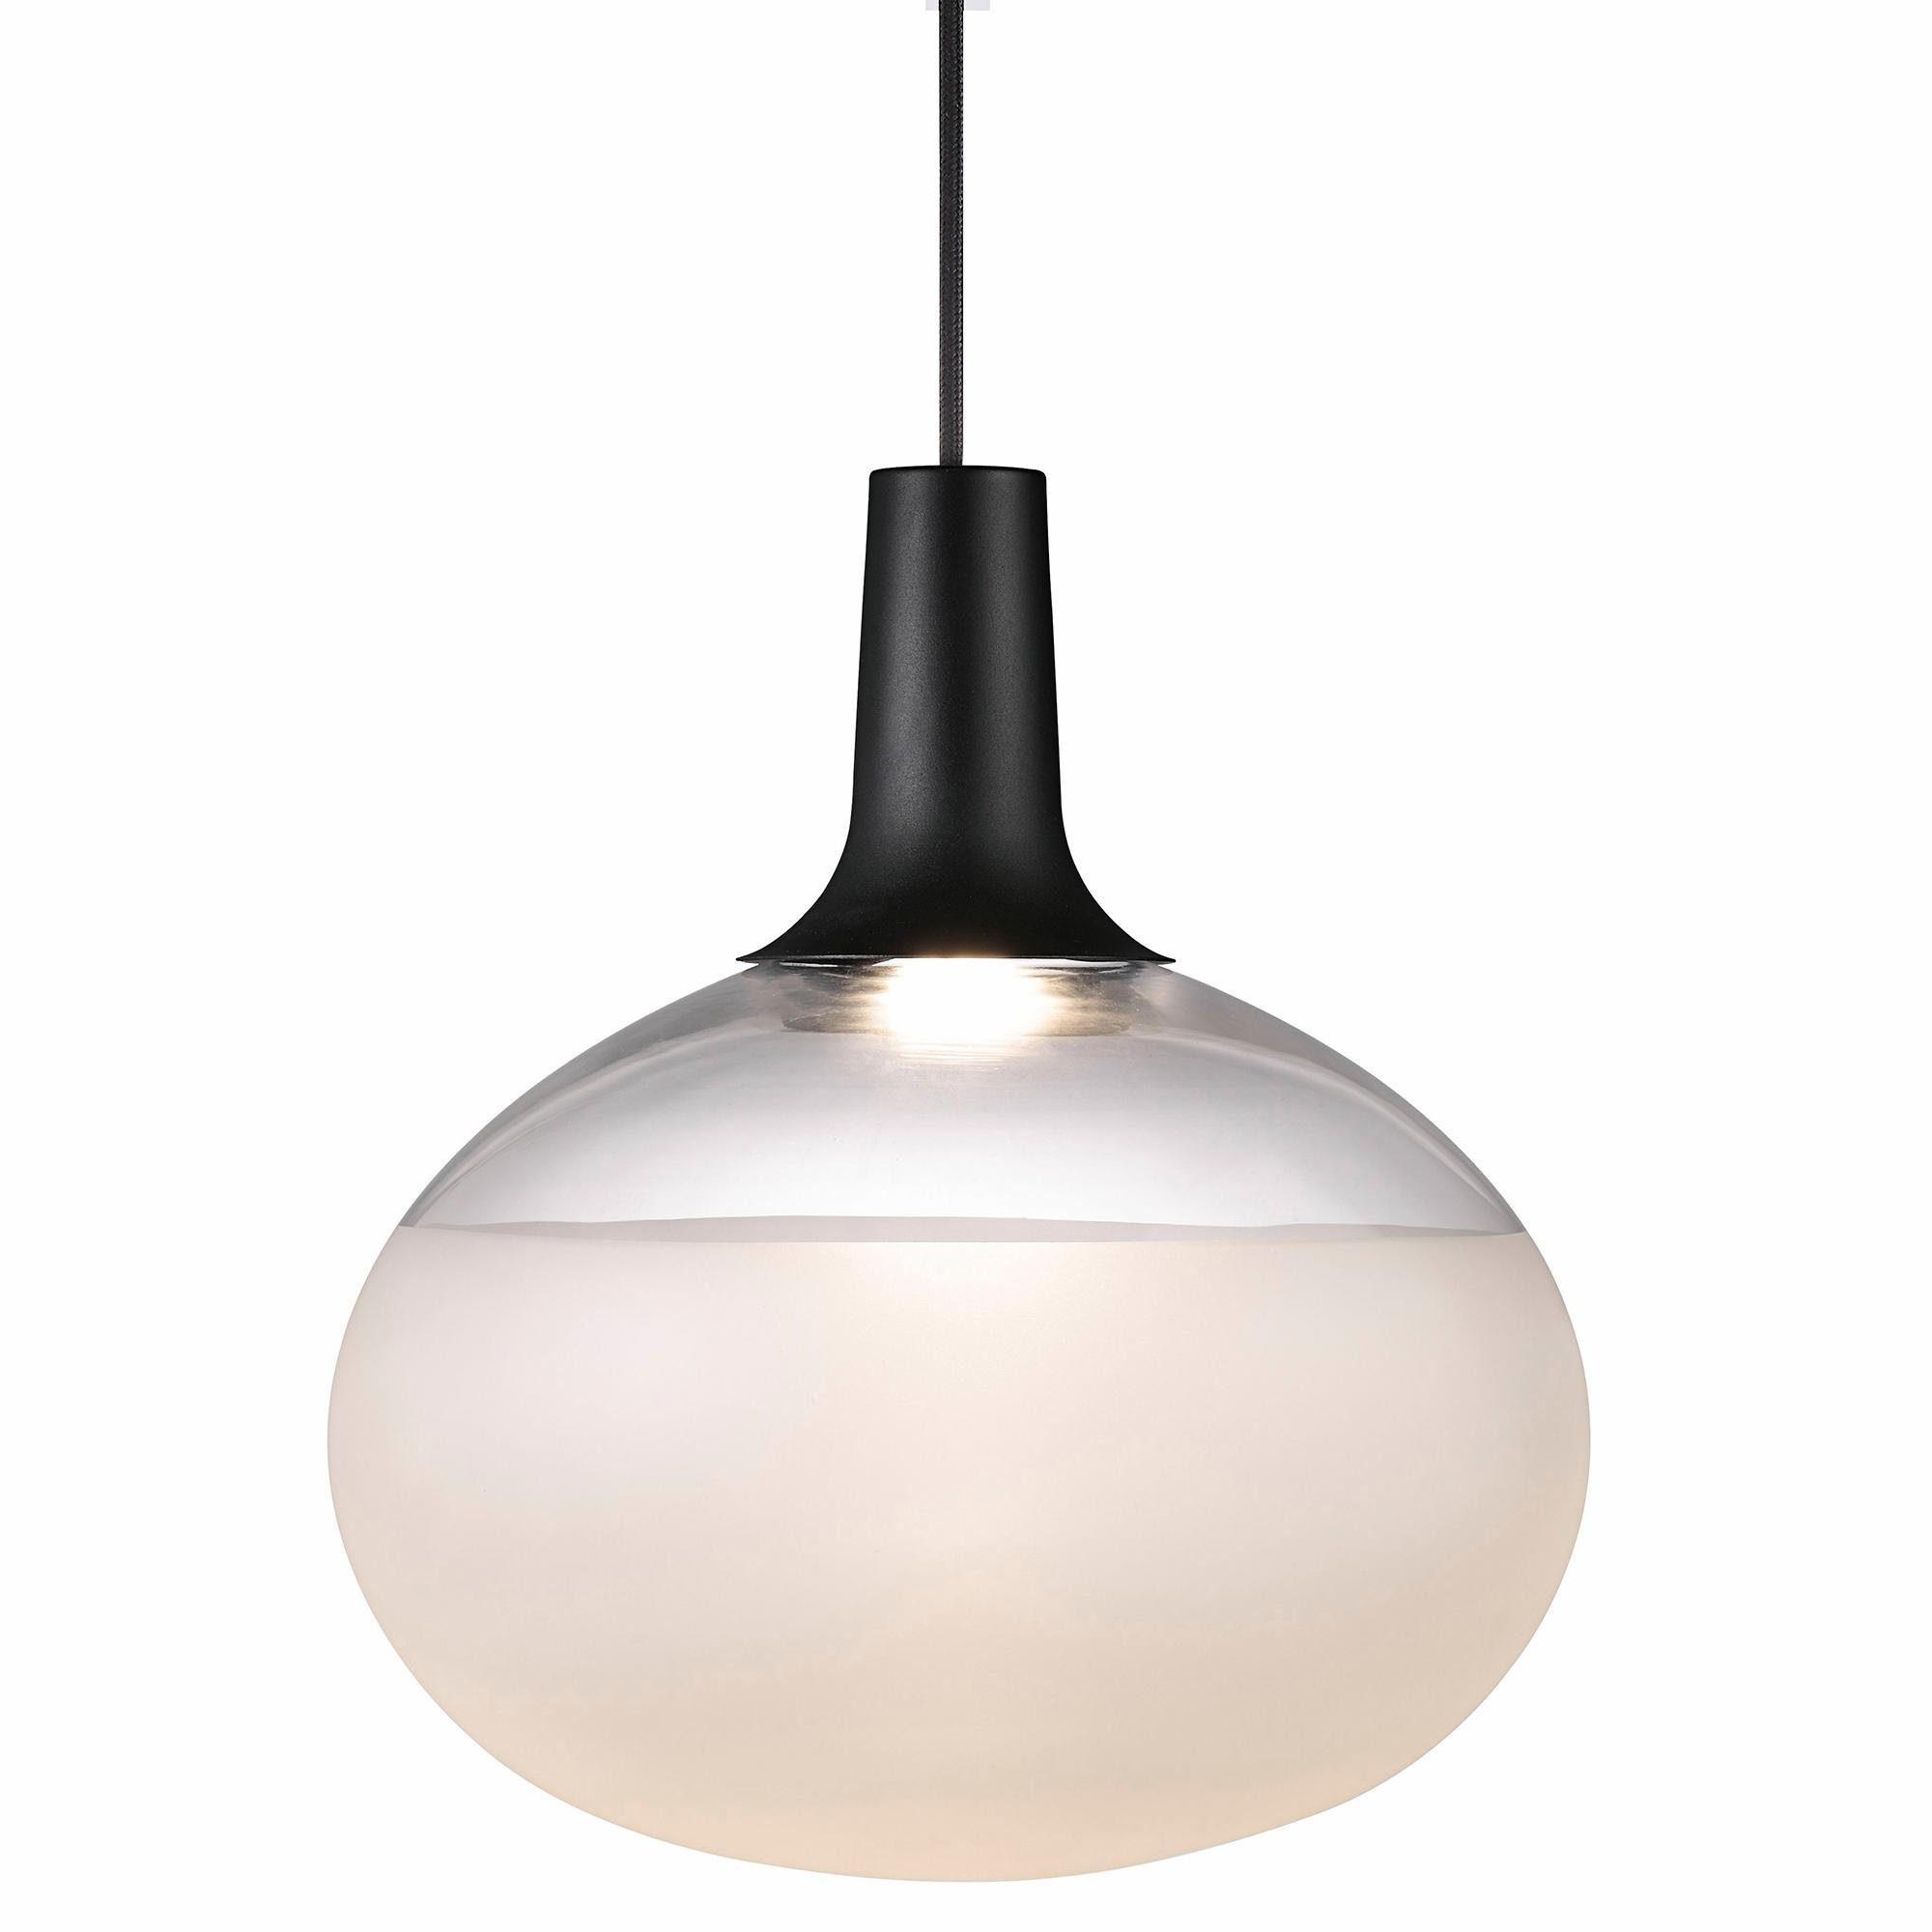 Nordlux LED Pendelleuchte »DEE glass«, 1-flammig